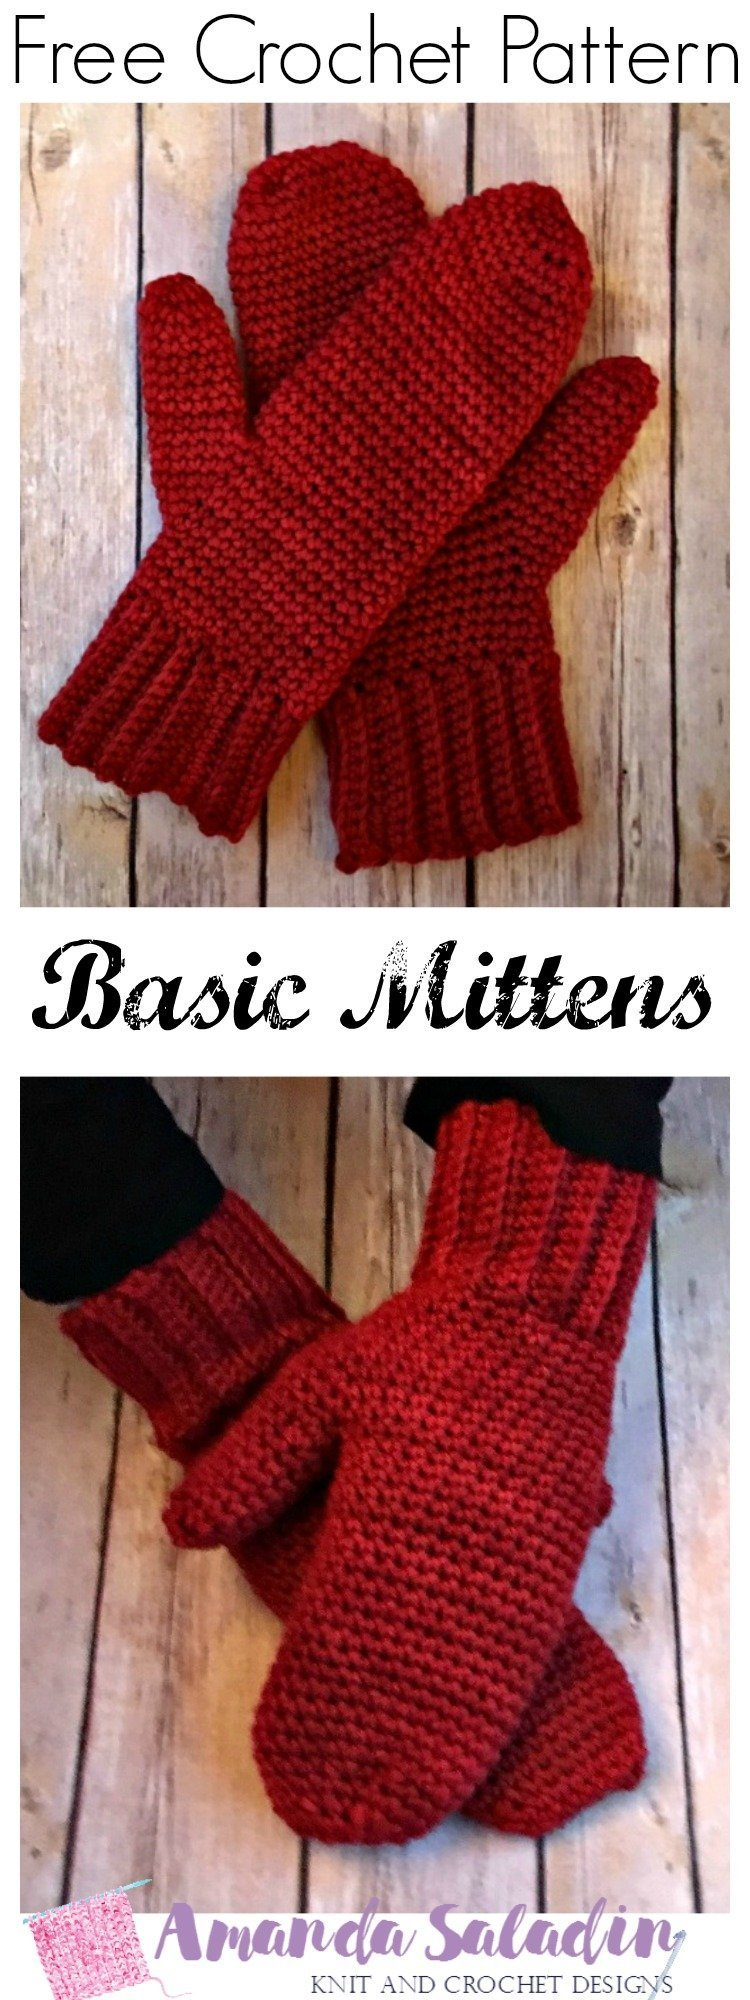 Free Crochet Pattern - Basic Mittens